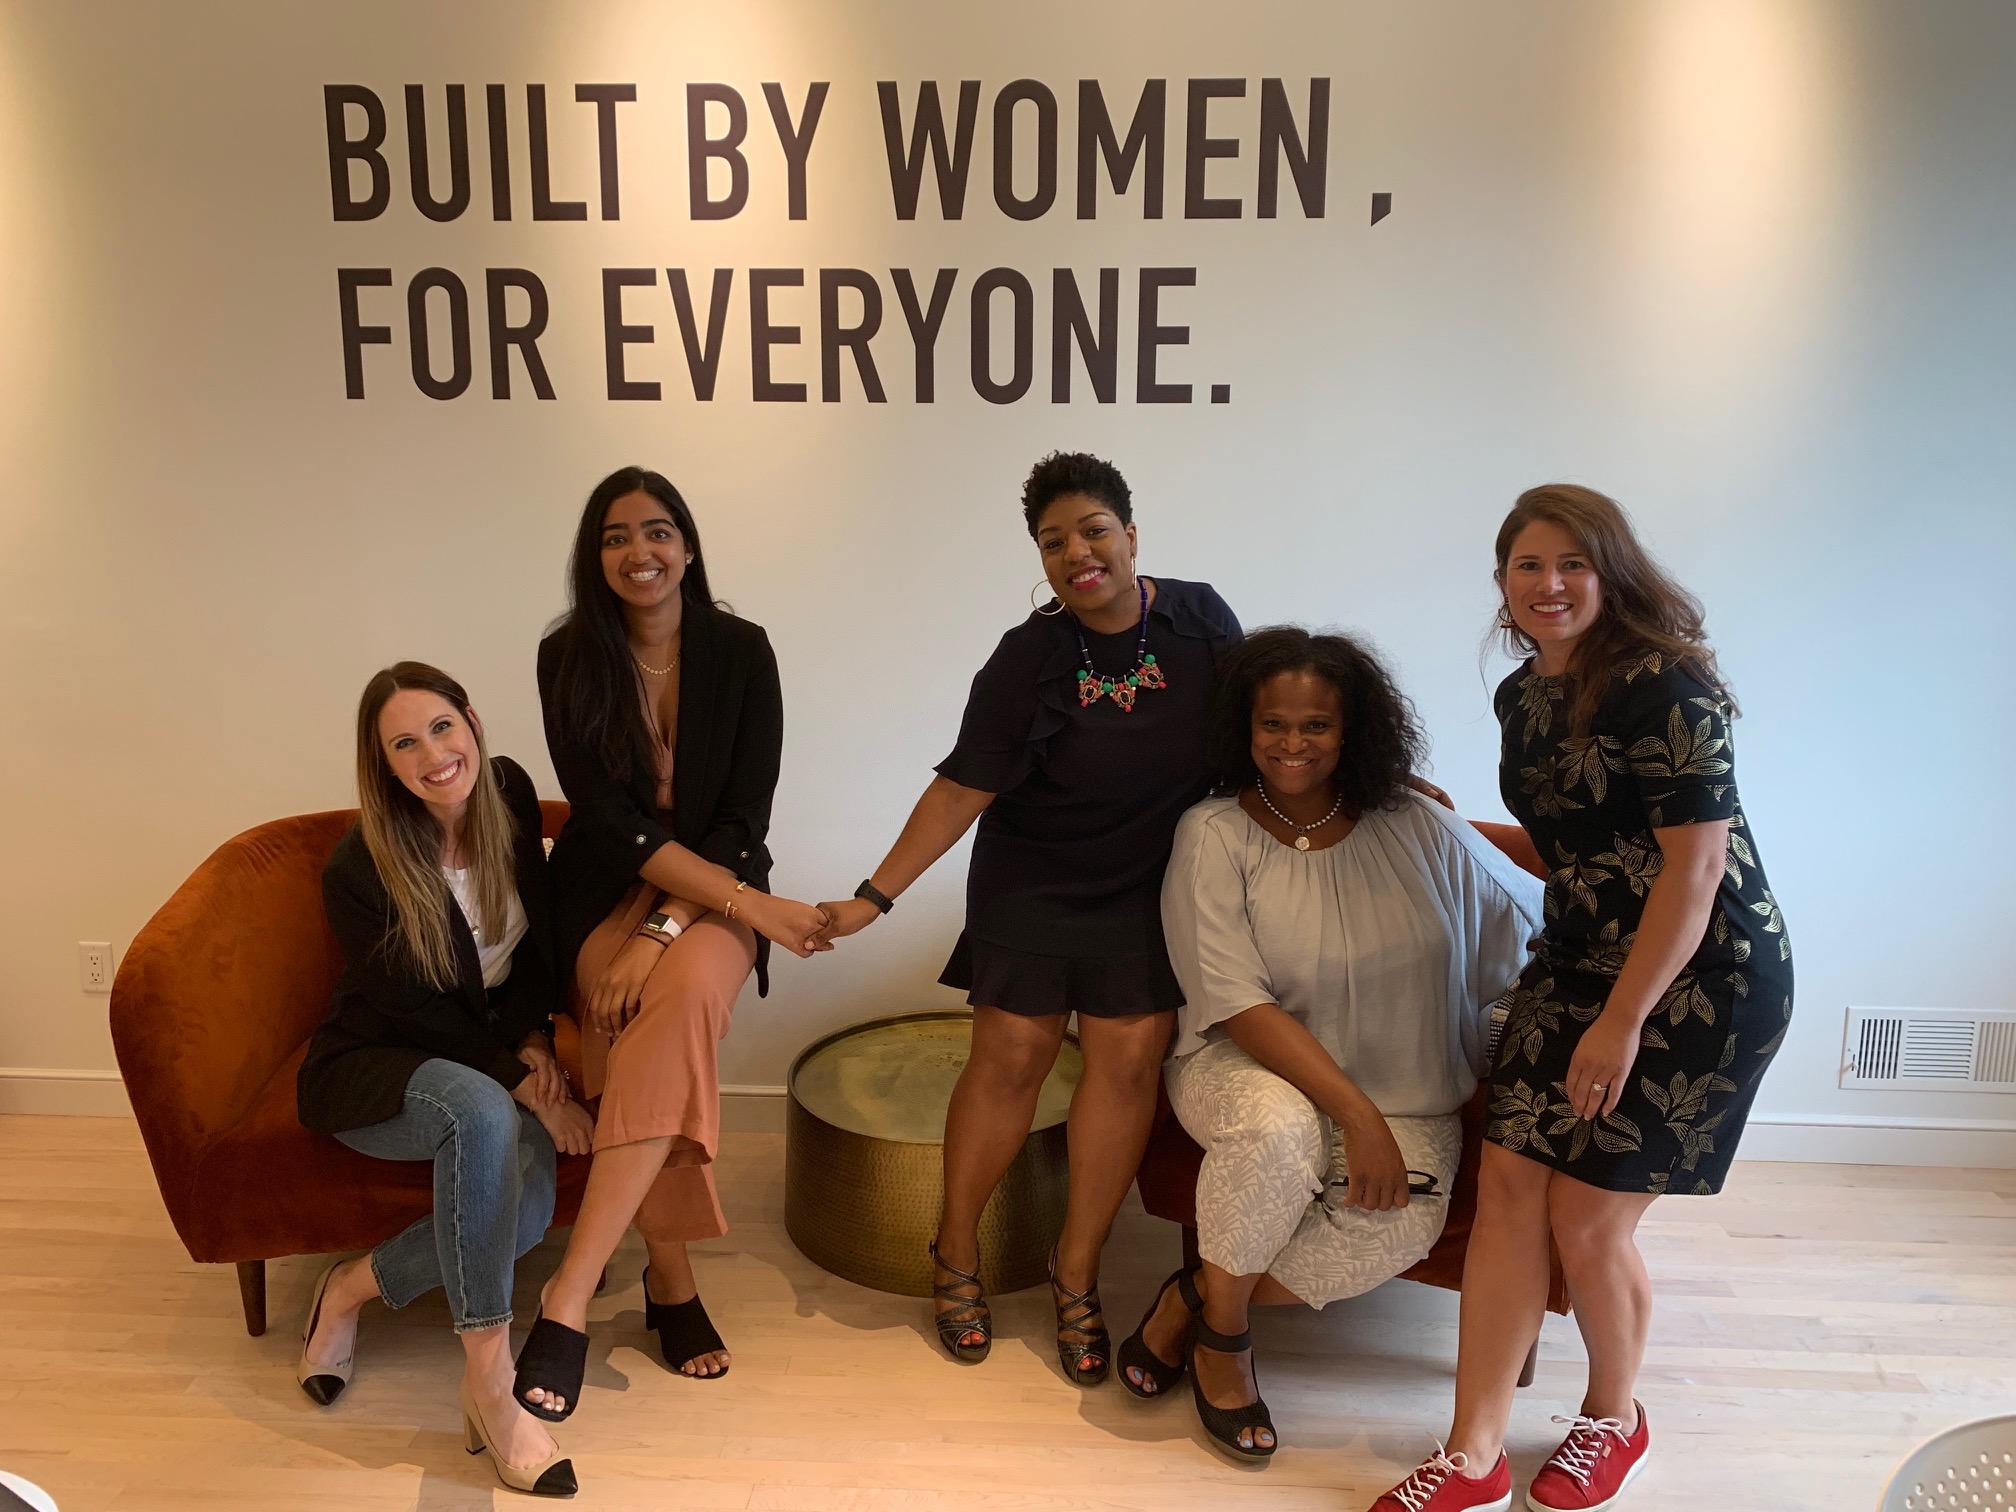 Sarah Grap (Mall of America), Raeesa Motala (Lee & Associates), Seena Hodges, Miquel McMoore (kpcompanies) and Anita Patel (Bush Foundation)